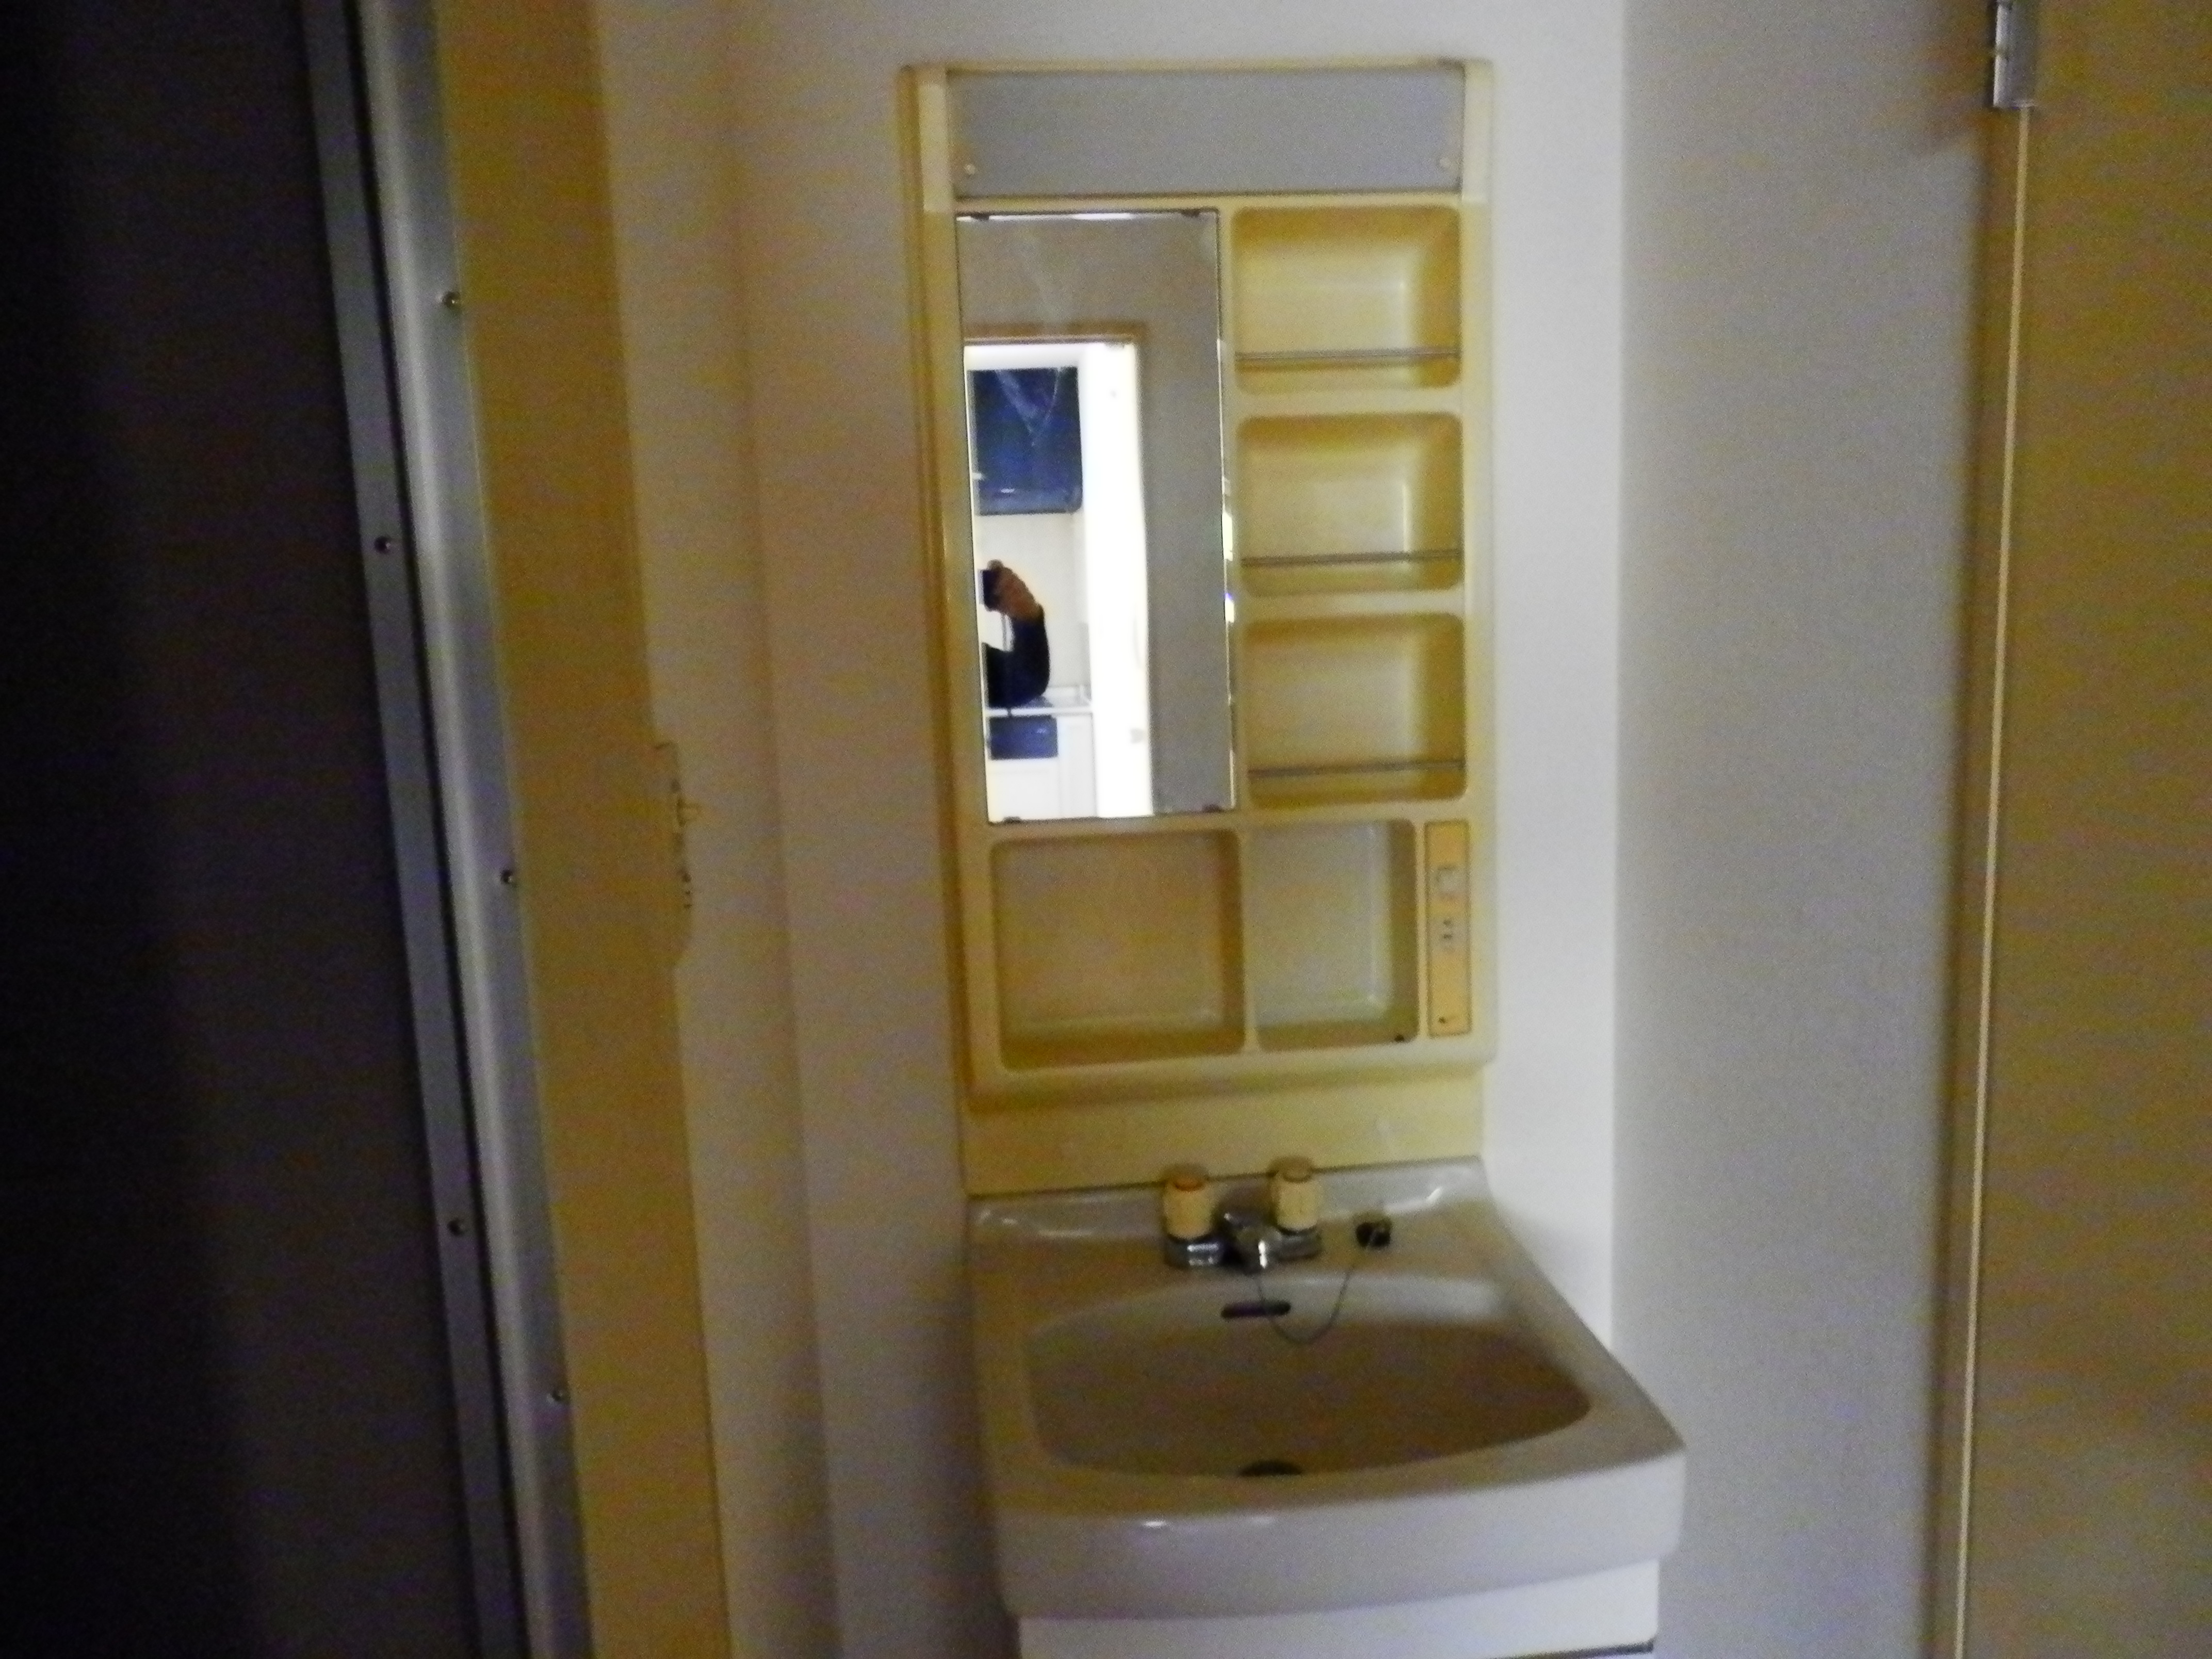 CA028(ボナール矢船)洗面台